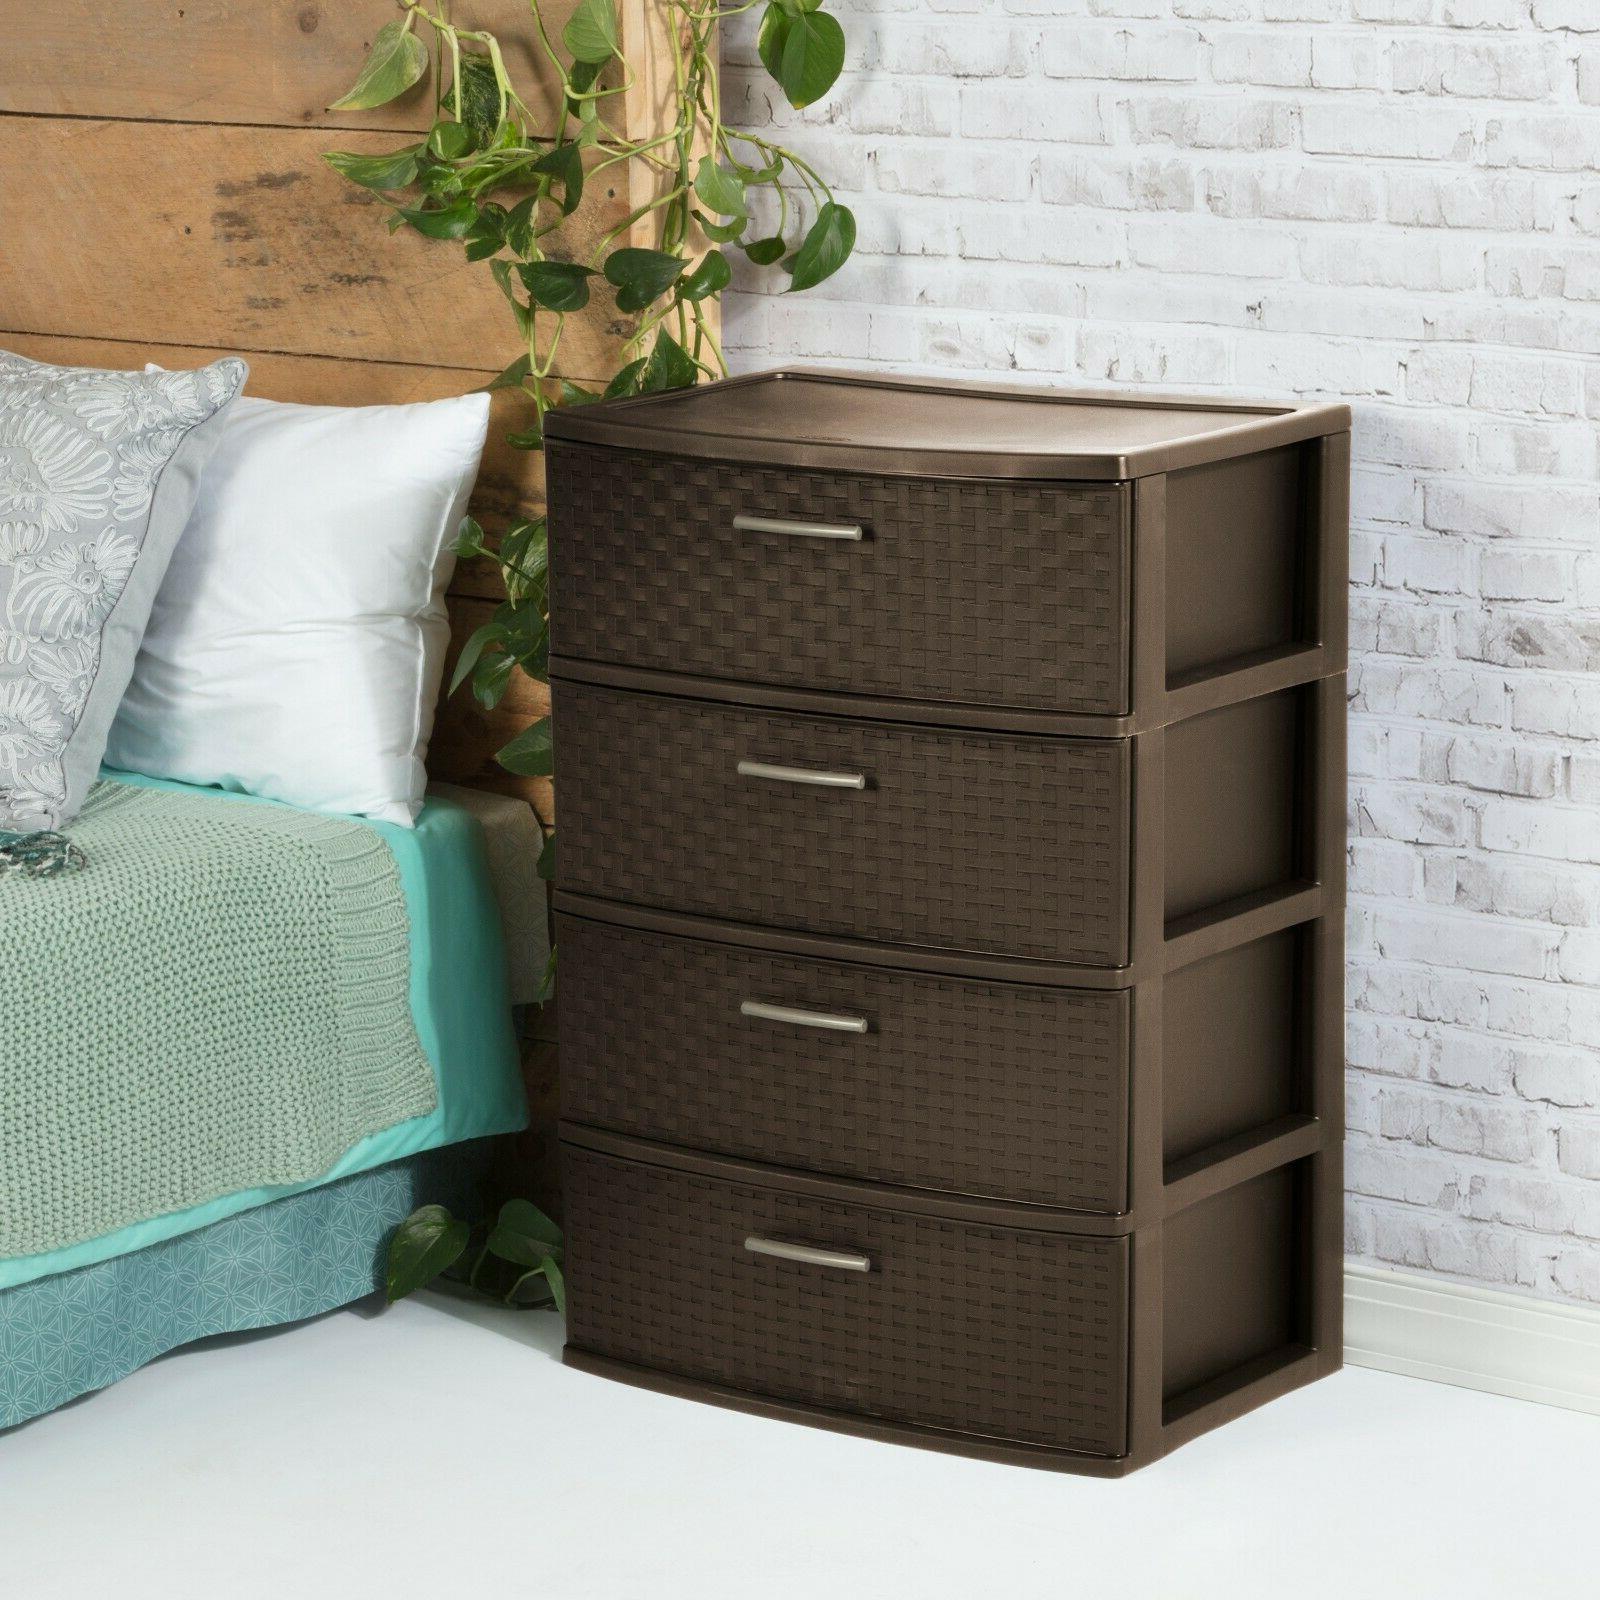 Plastic Cabinet Clothes Box Espresso Bedroom